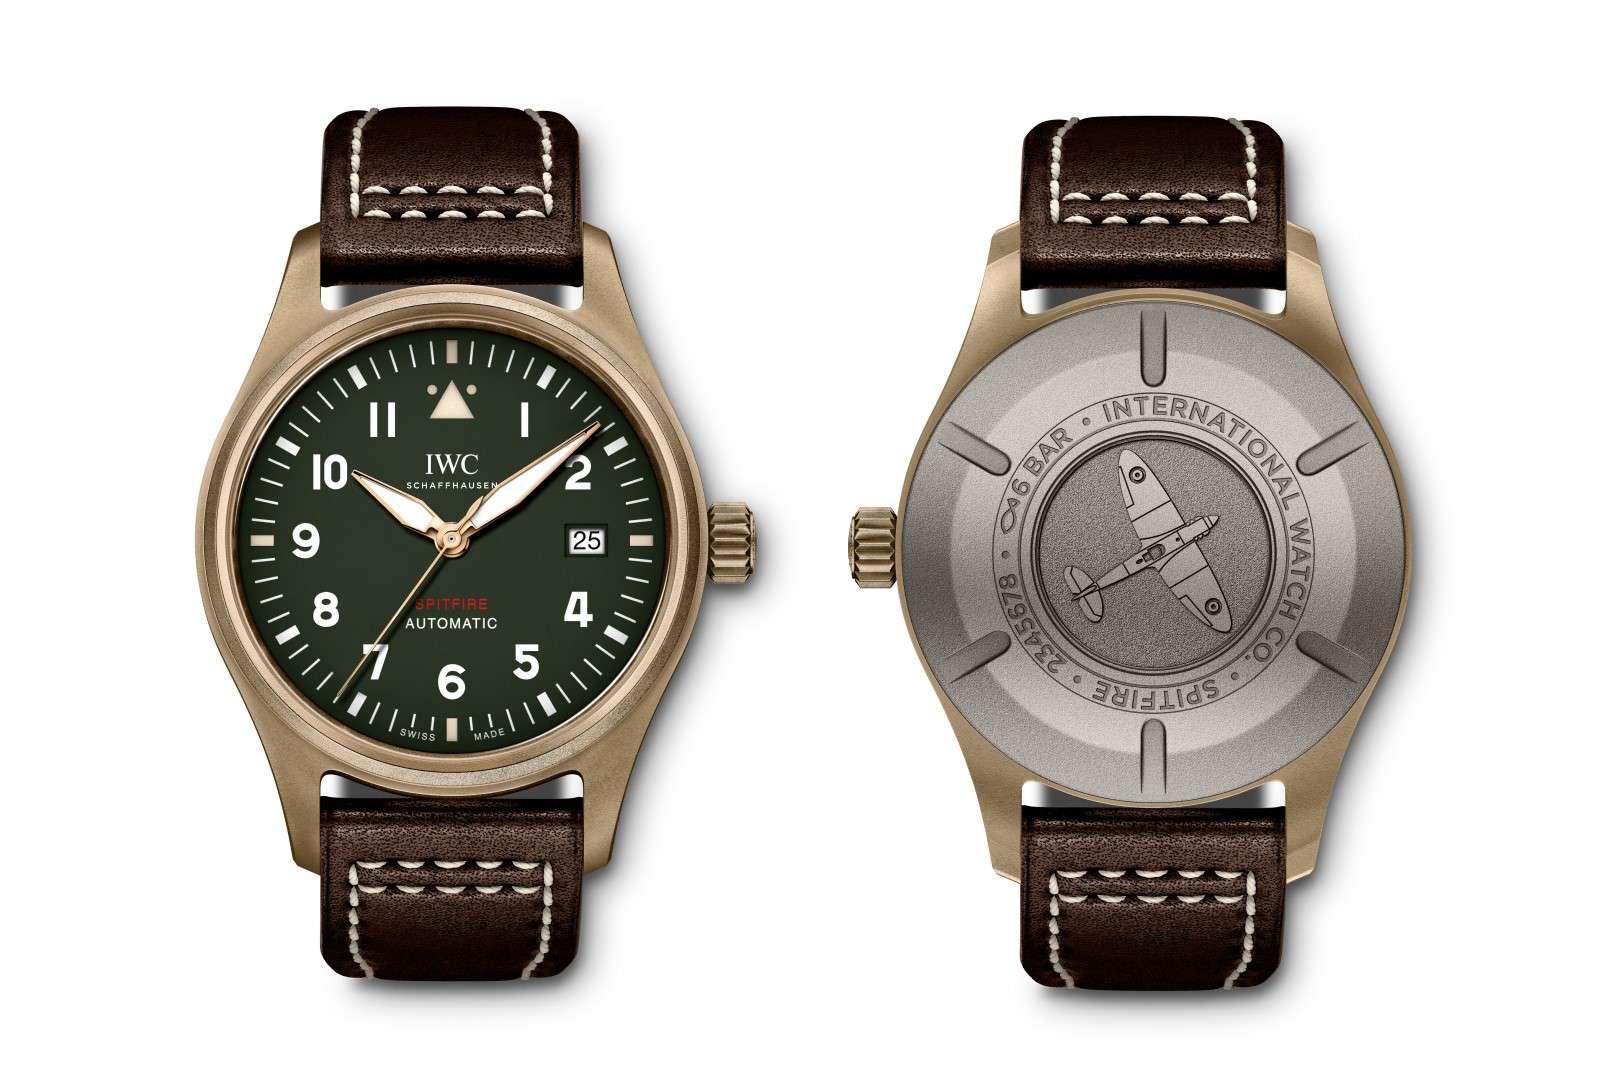 IWC Pilot's Watch Automatic Spitfire - SIHH 2019